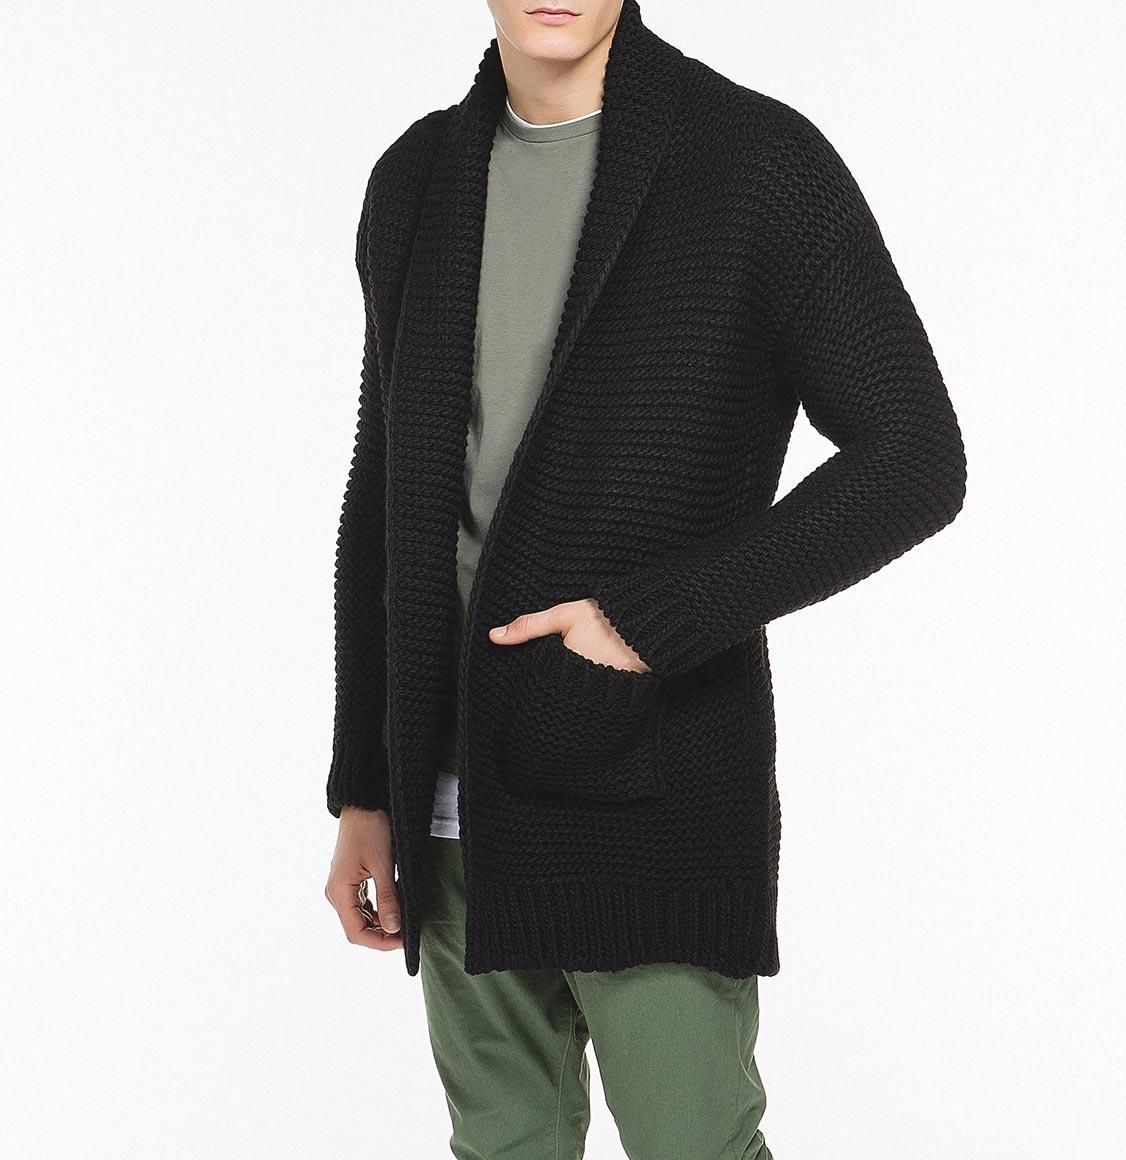 Oversized Shawl Collar Wool Blend Cardigan Black